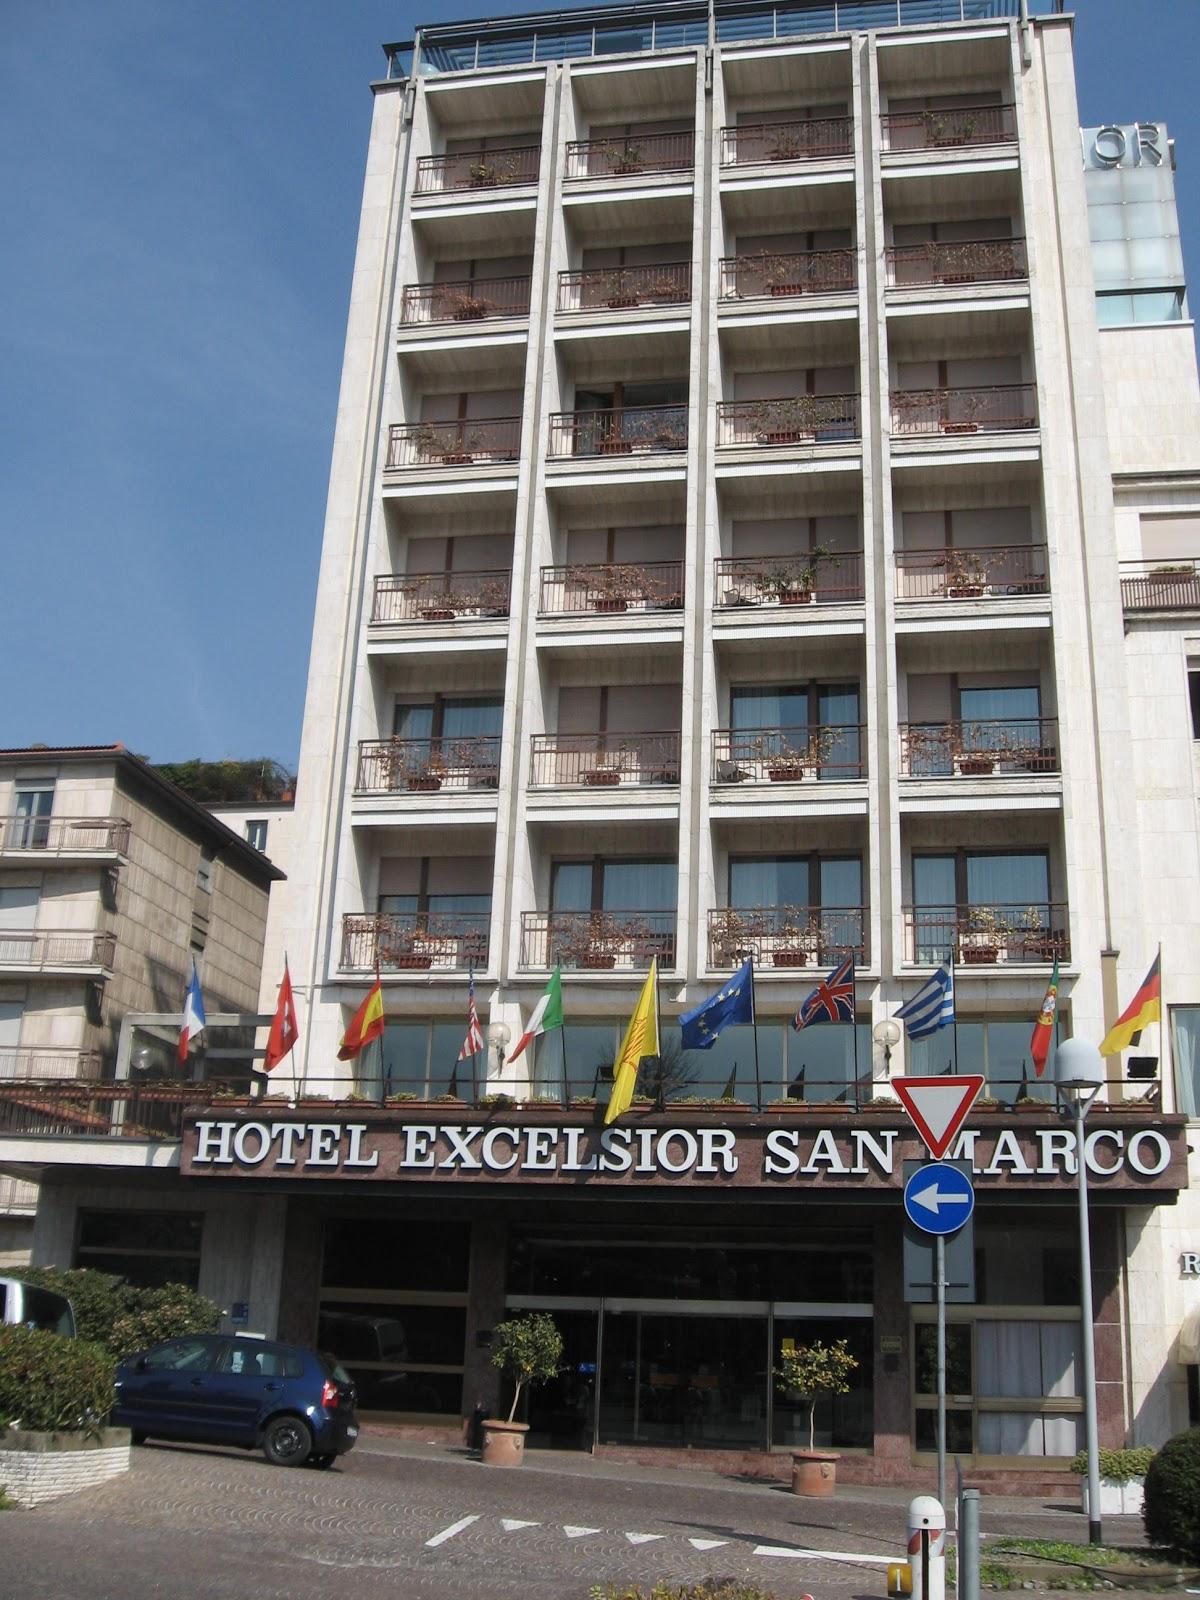 Excelsior San Marco Hotel Bergamo Italy